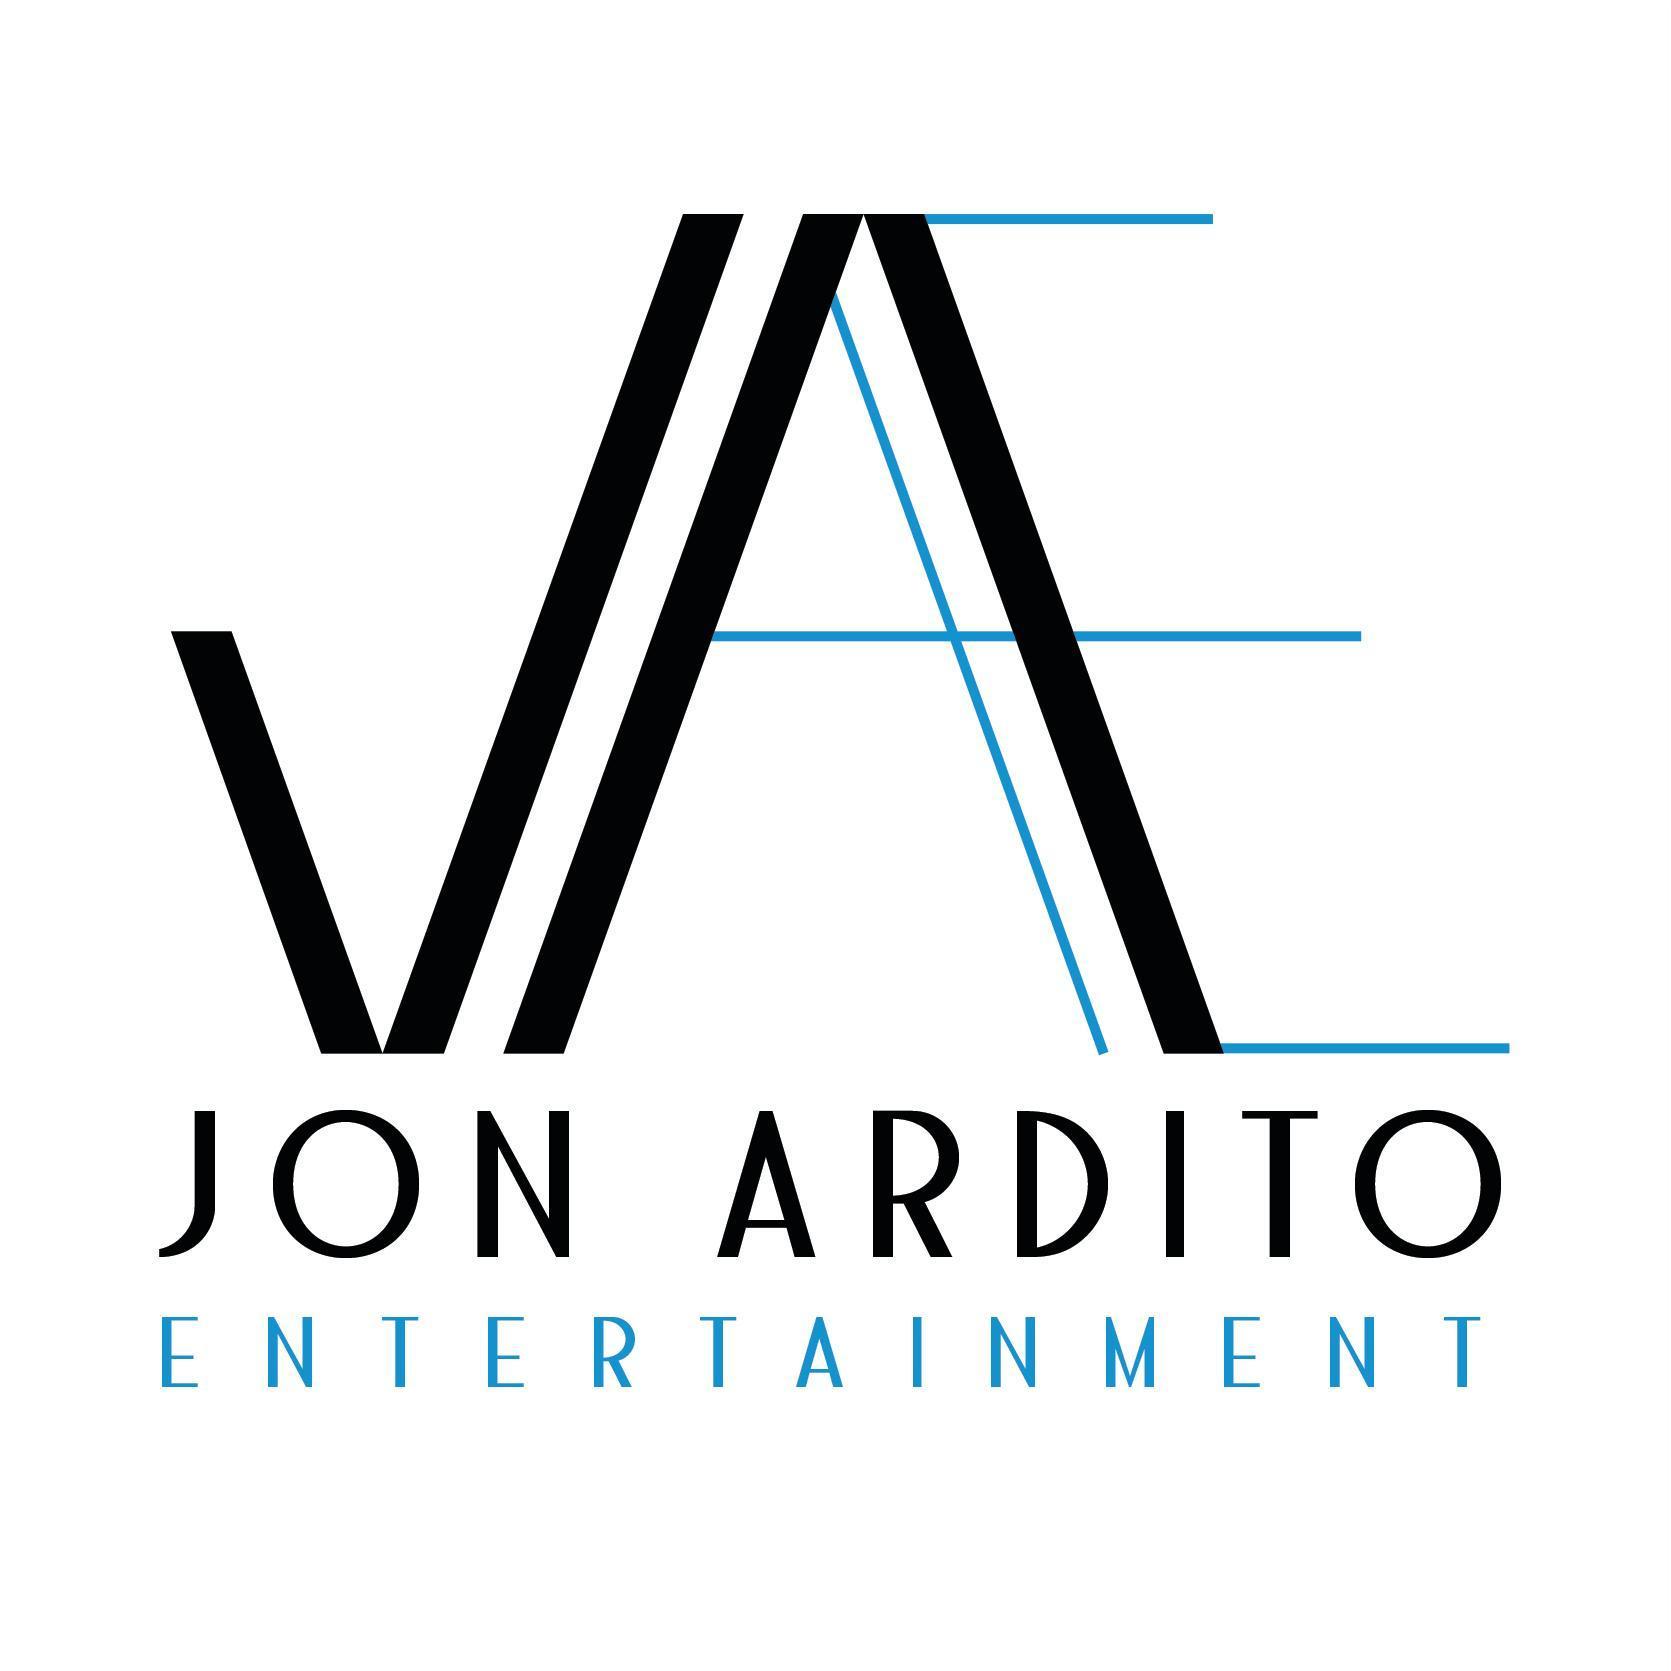 Jon Ardito Entertainment - Philadelphia Wedding Bands and DJs